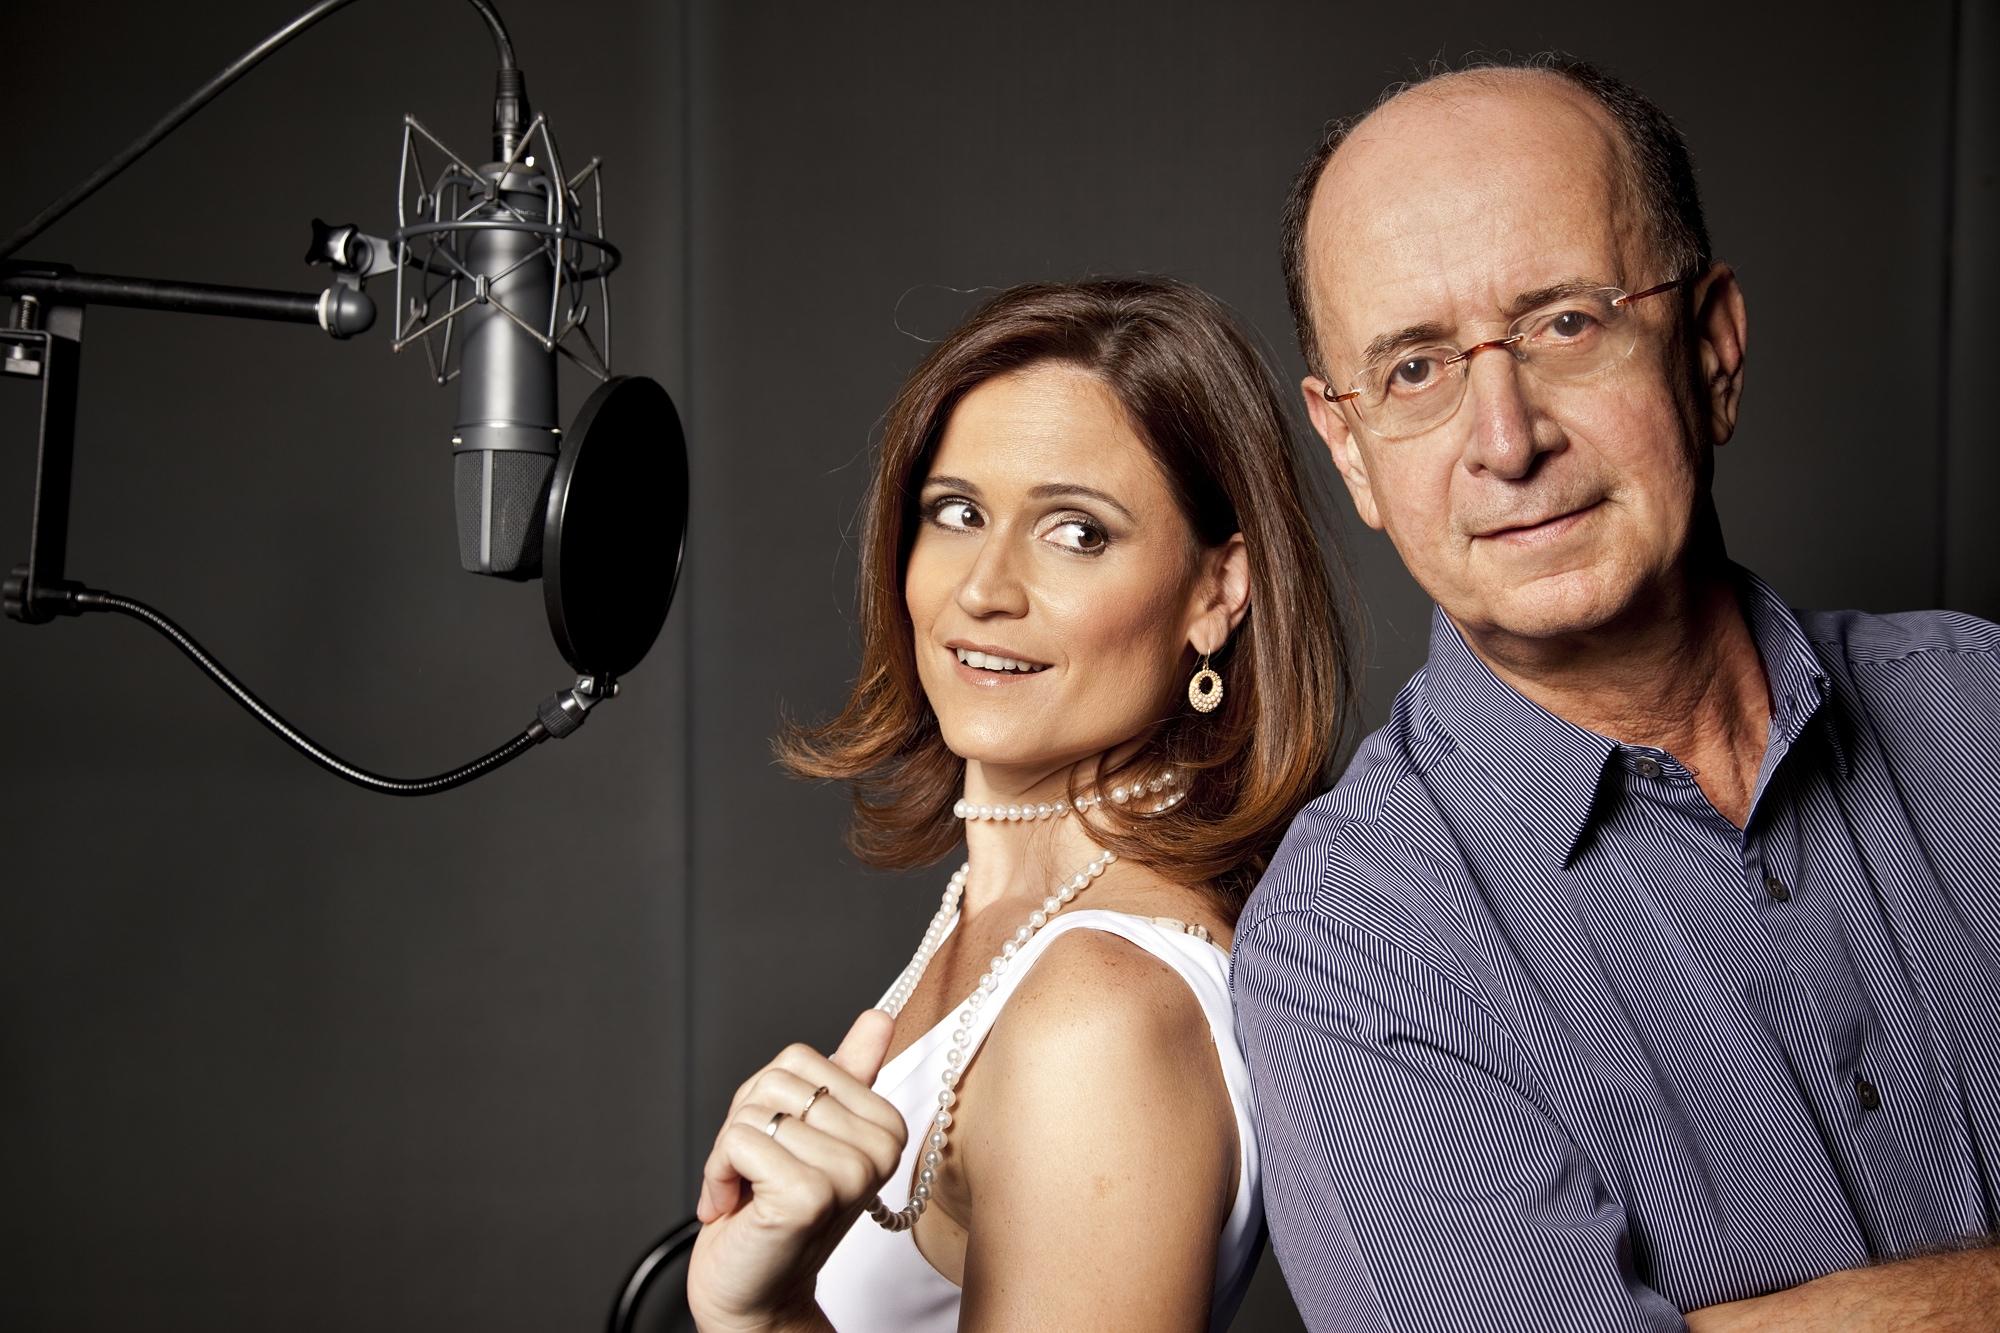 Carol Saboya and Antonio Adolfo